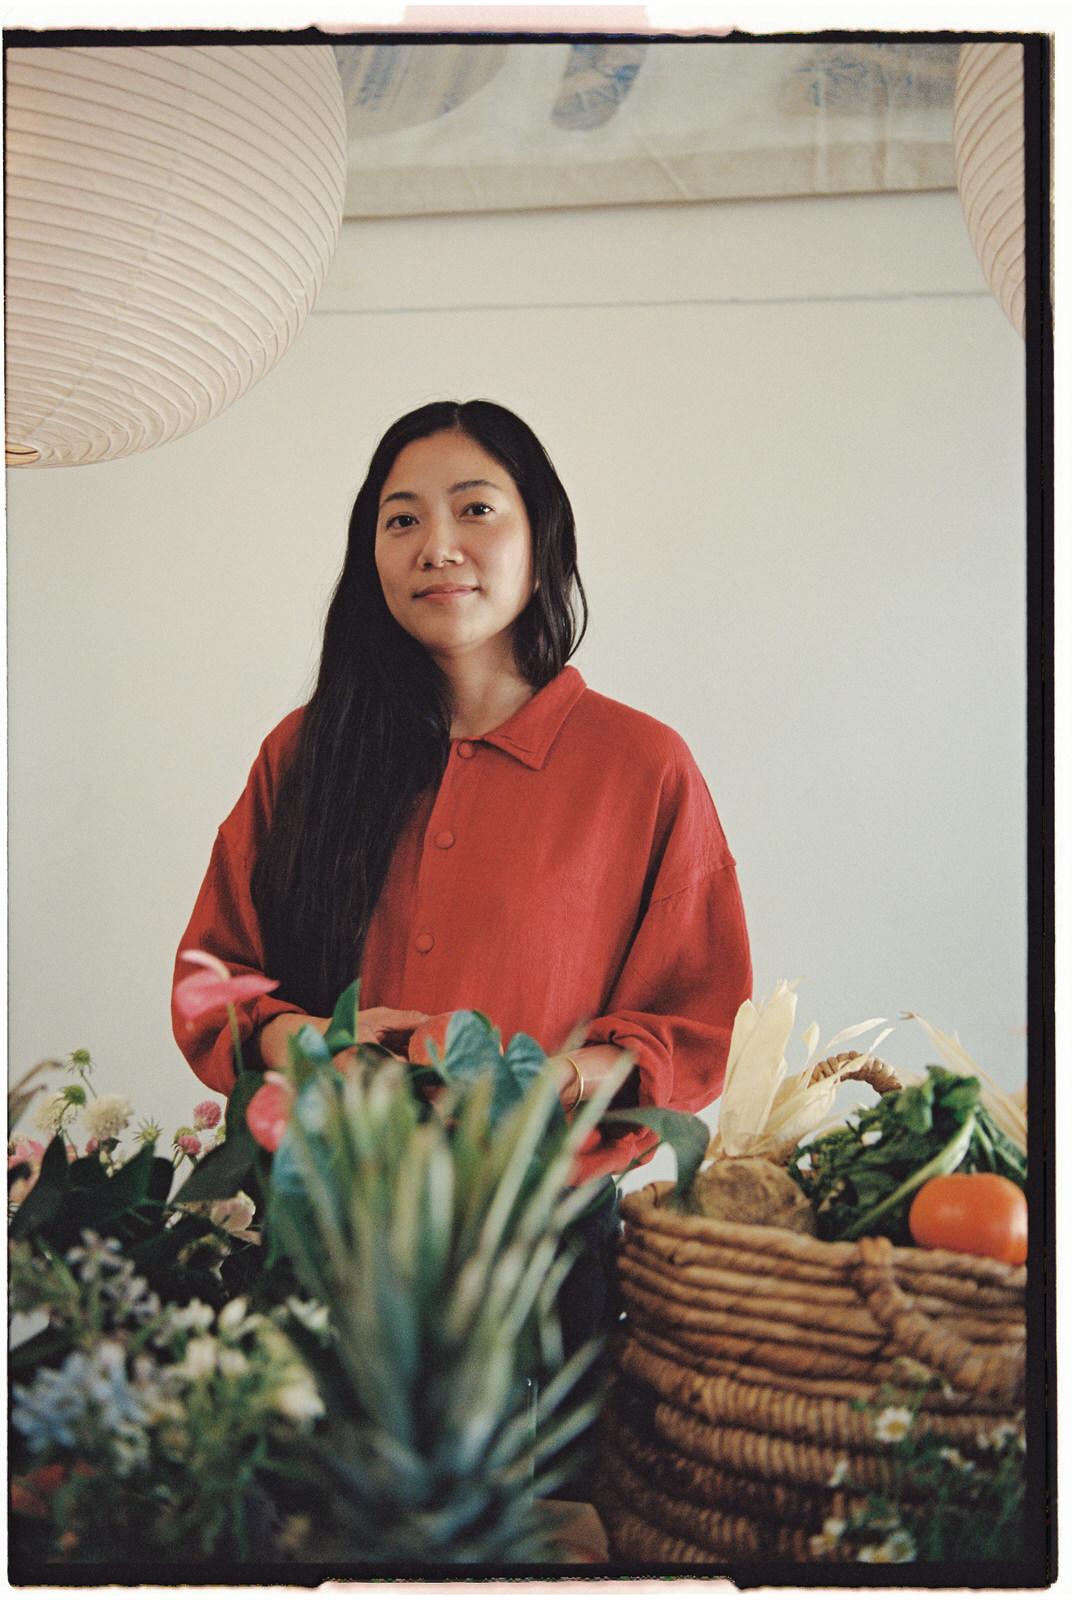 Justin Chung, Saehee Cho, American Giant, Kodak